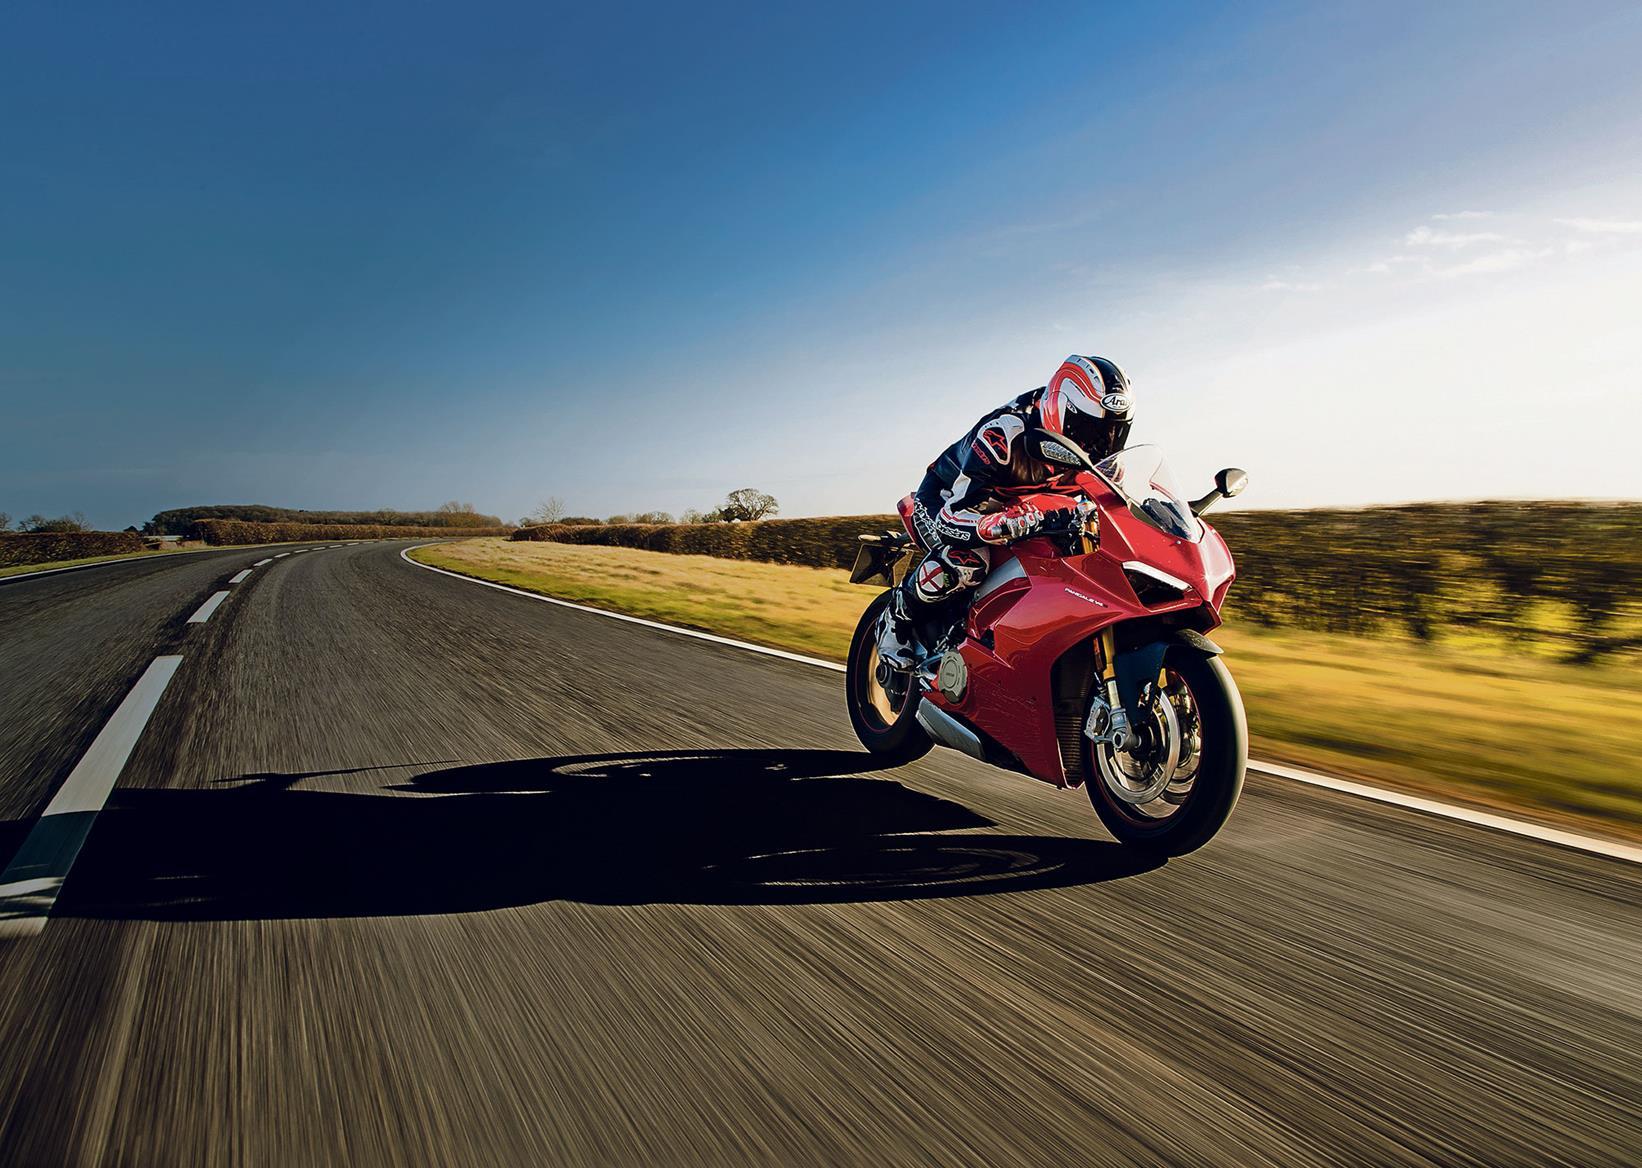 Ducati Panigale V4 arrives